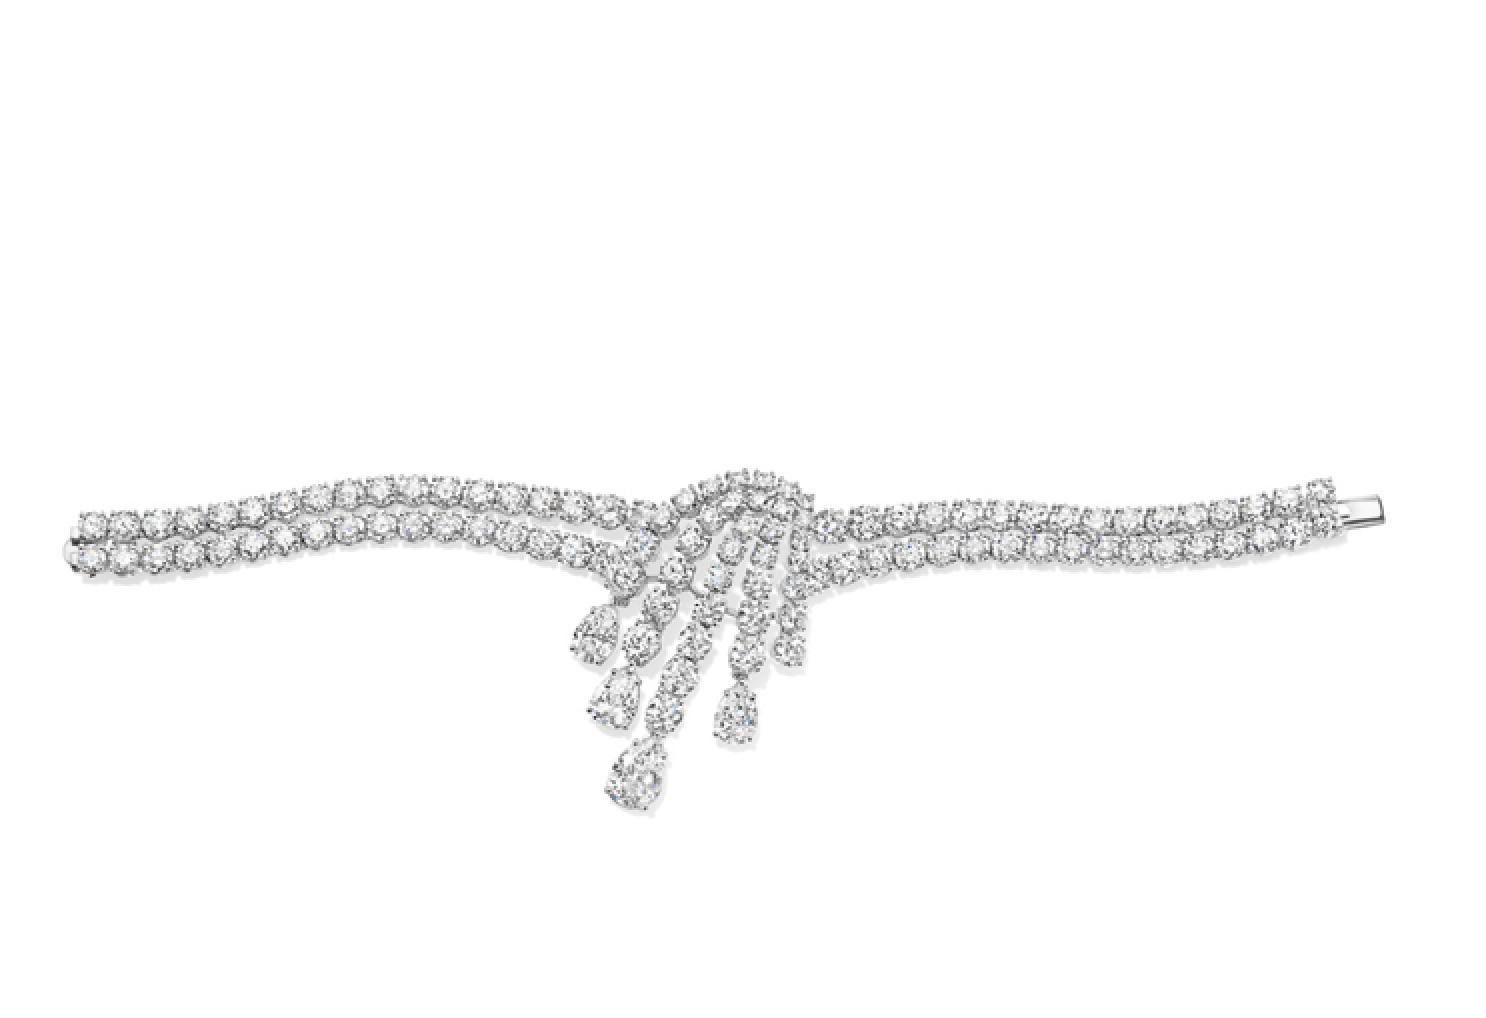 Harry Winston海瑞溫斯頓 Splash系列 Bracelet